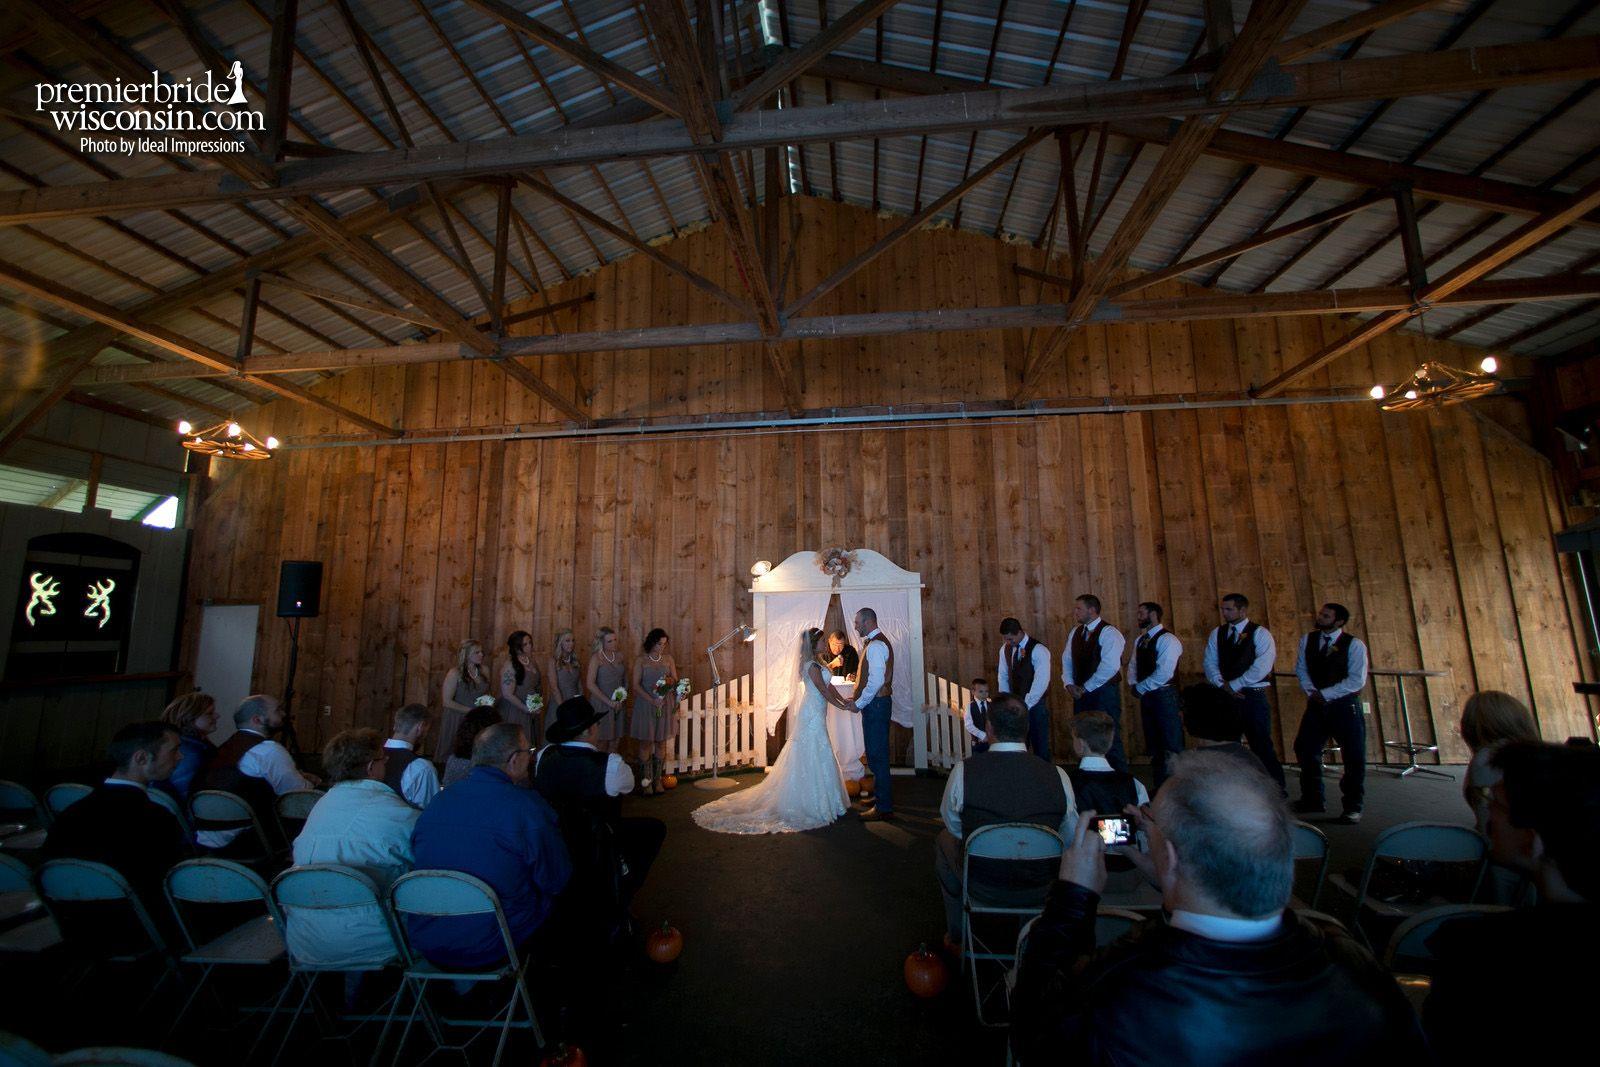 Real Wedding Sam And Tom Premier Bride Wisconsin Premier Bride Wedding Planning Guide Bride Guide